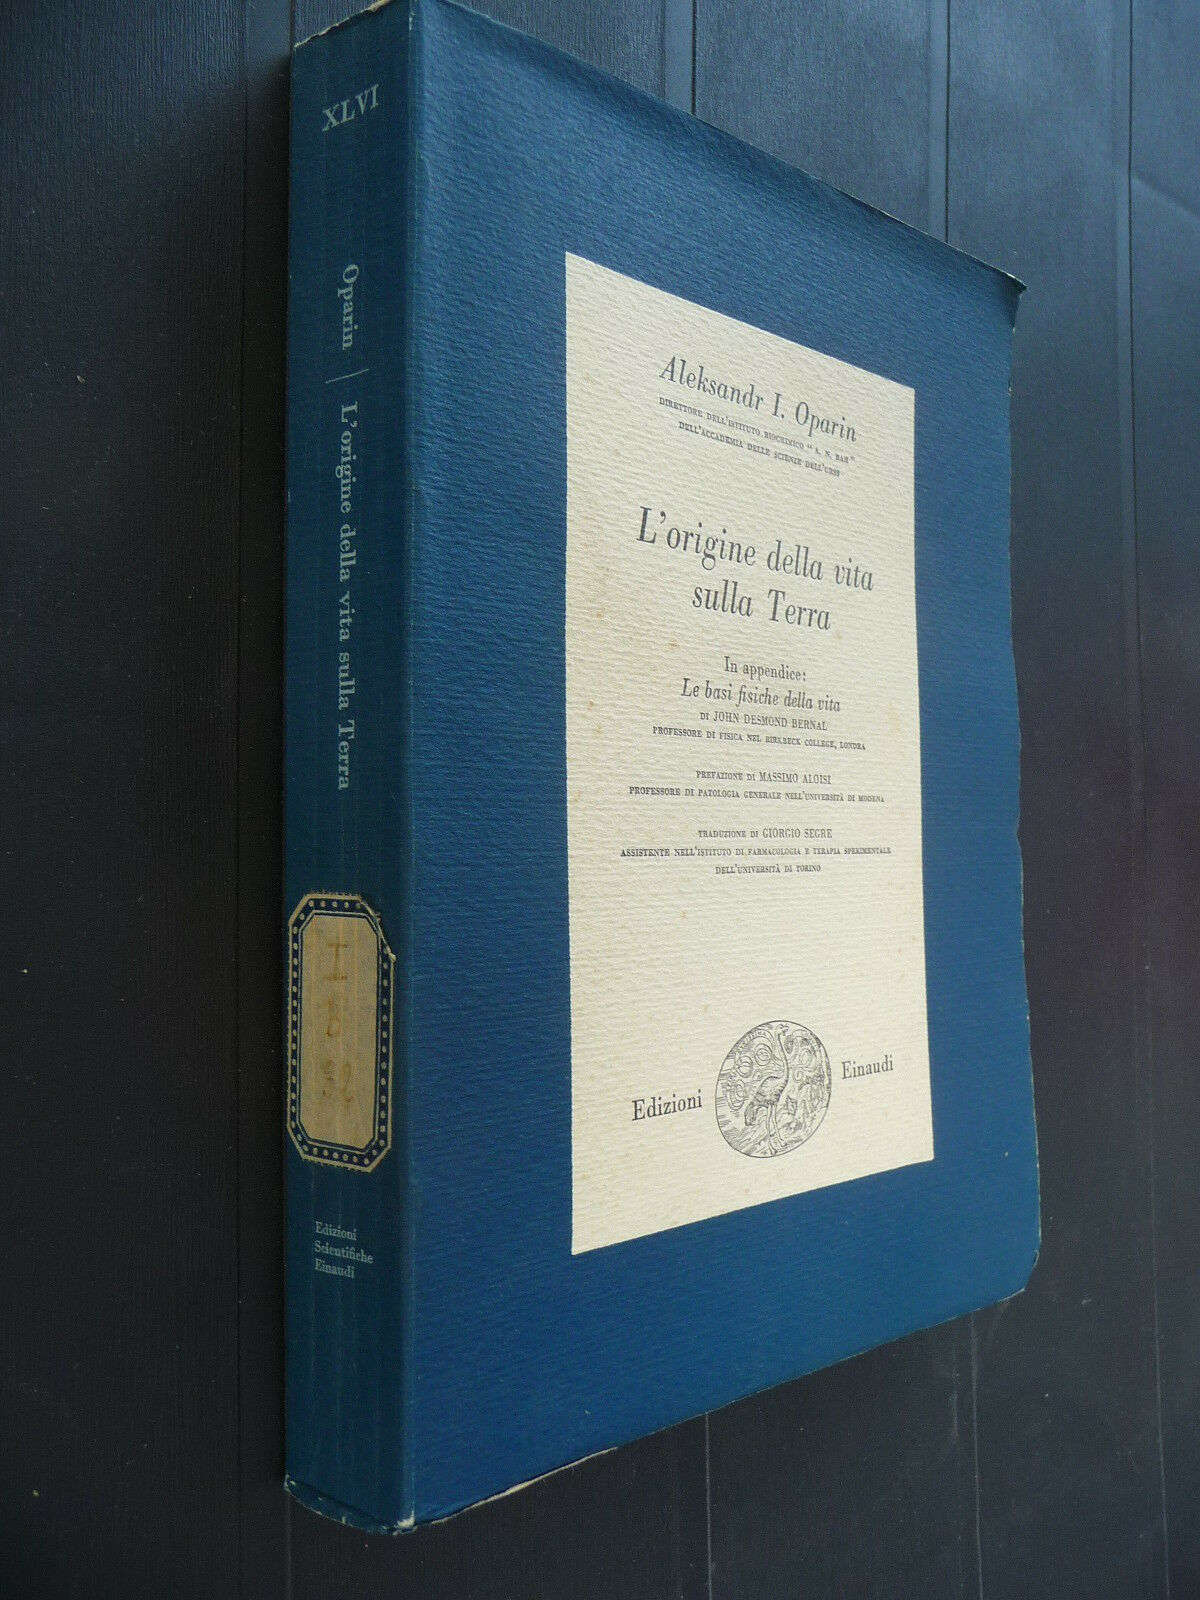 L'ORIGINE DELLA VITA SULLA TERRA ALEKSANDR I. OPARIN EINAUDI 1956 I^ Ed.